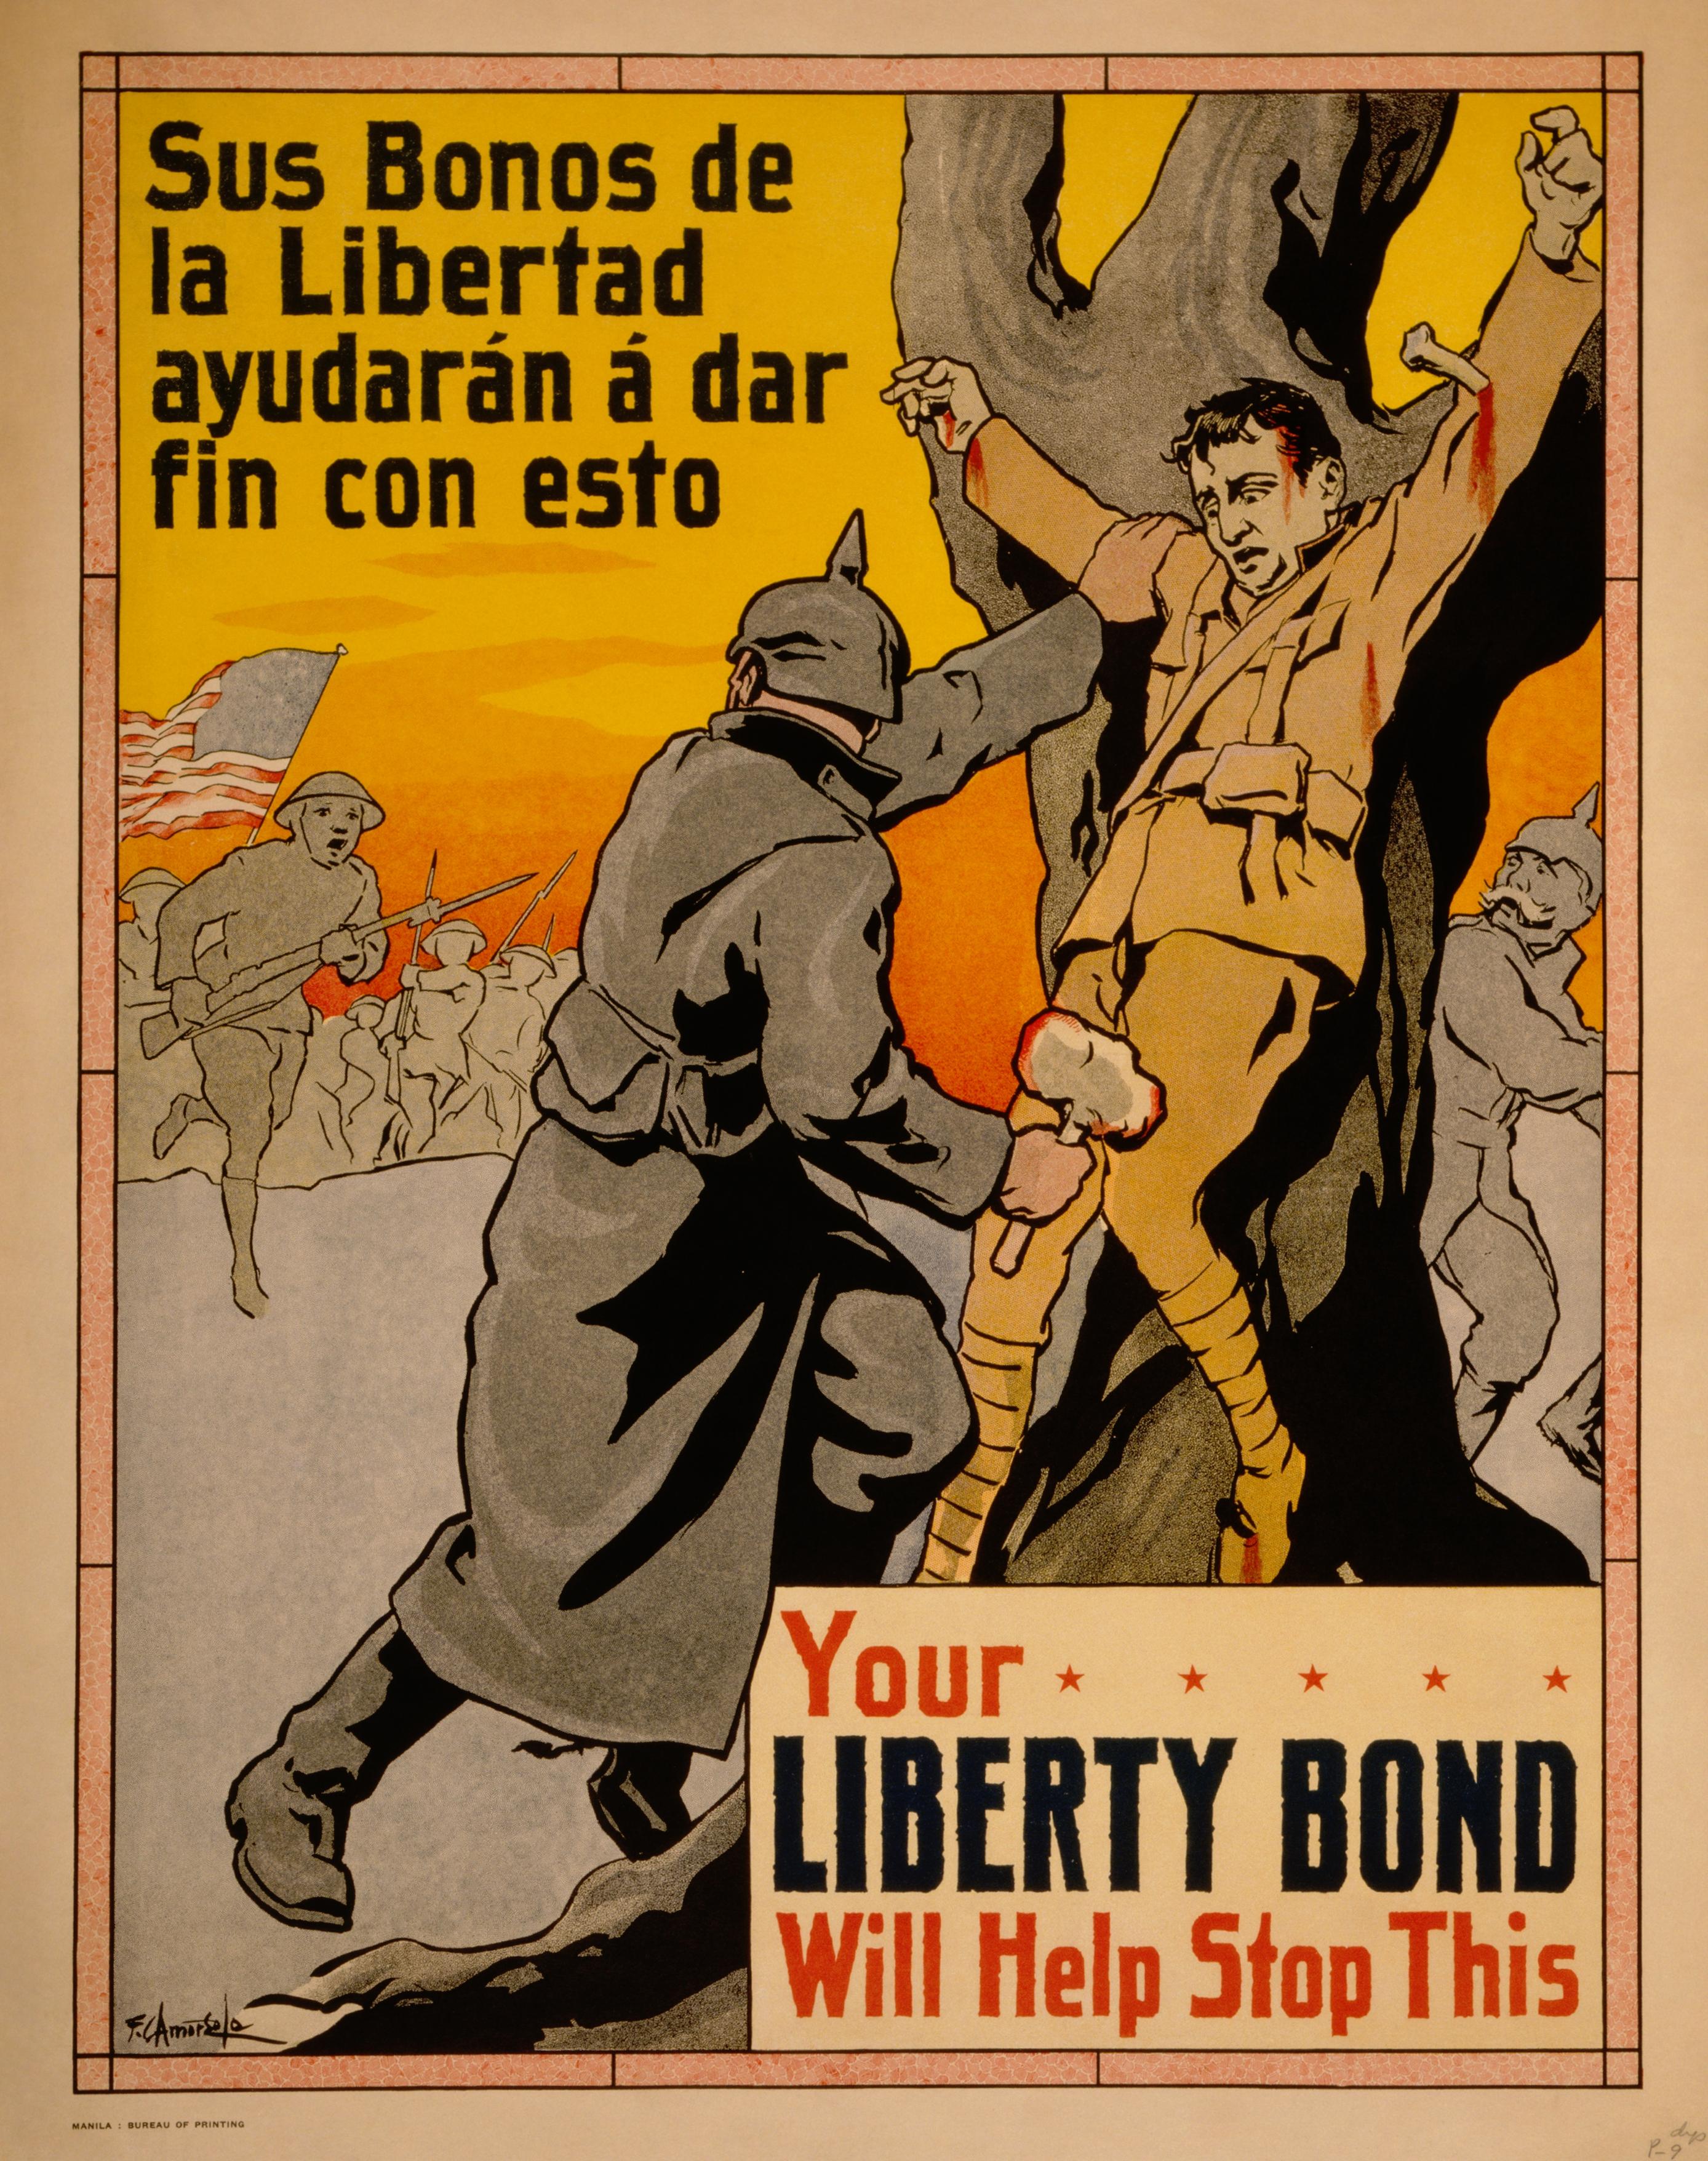 World War One Propaganda Mini Lesson – The Flocabulary Blog